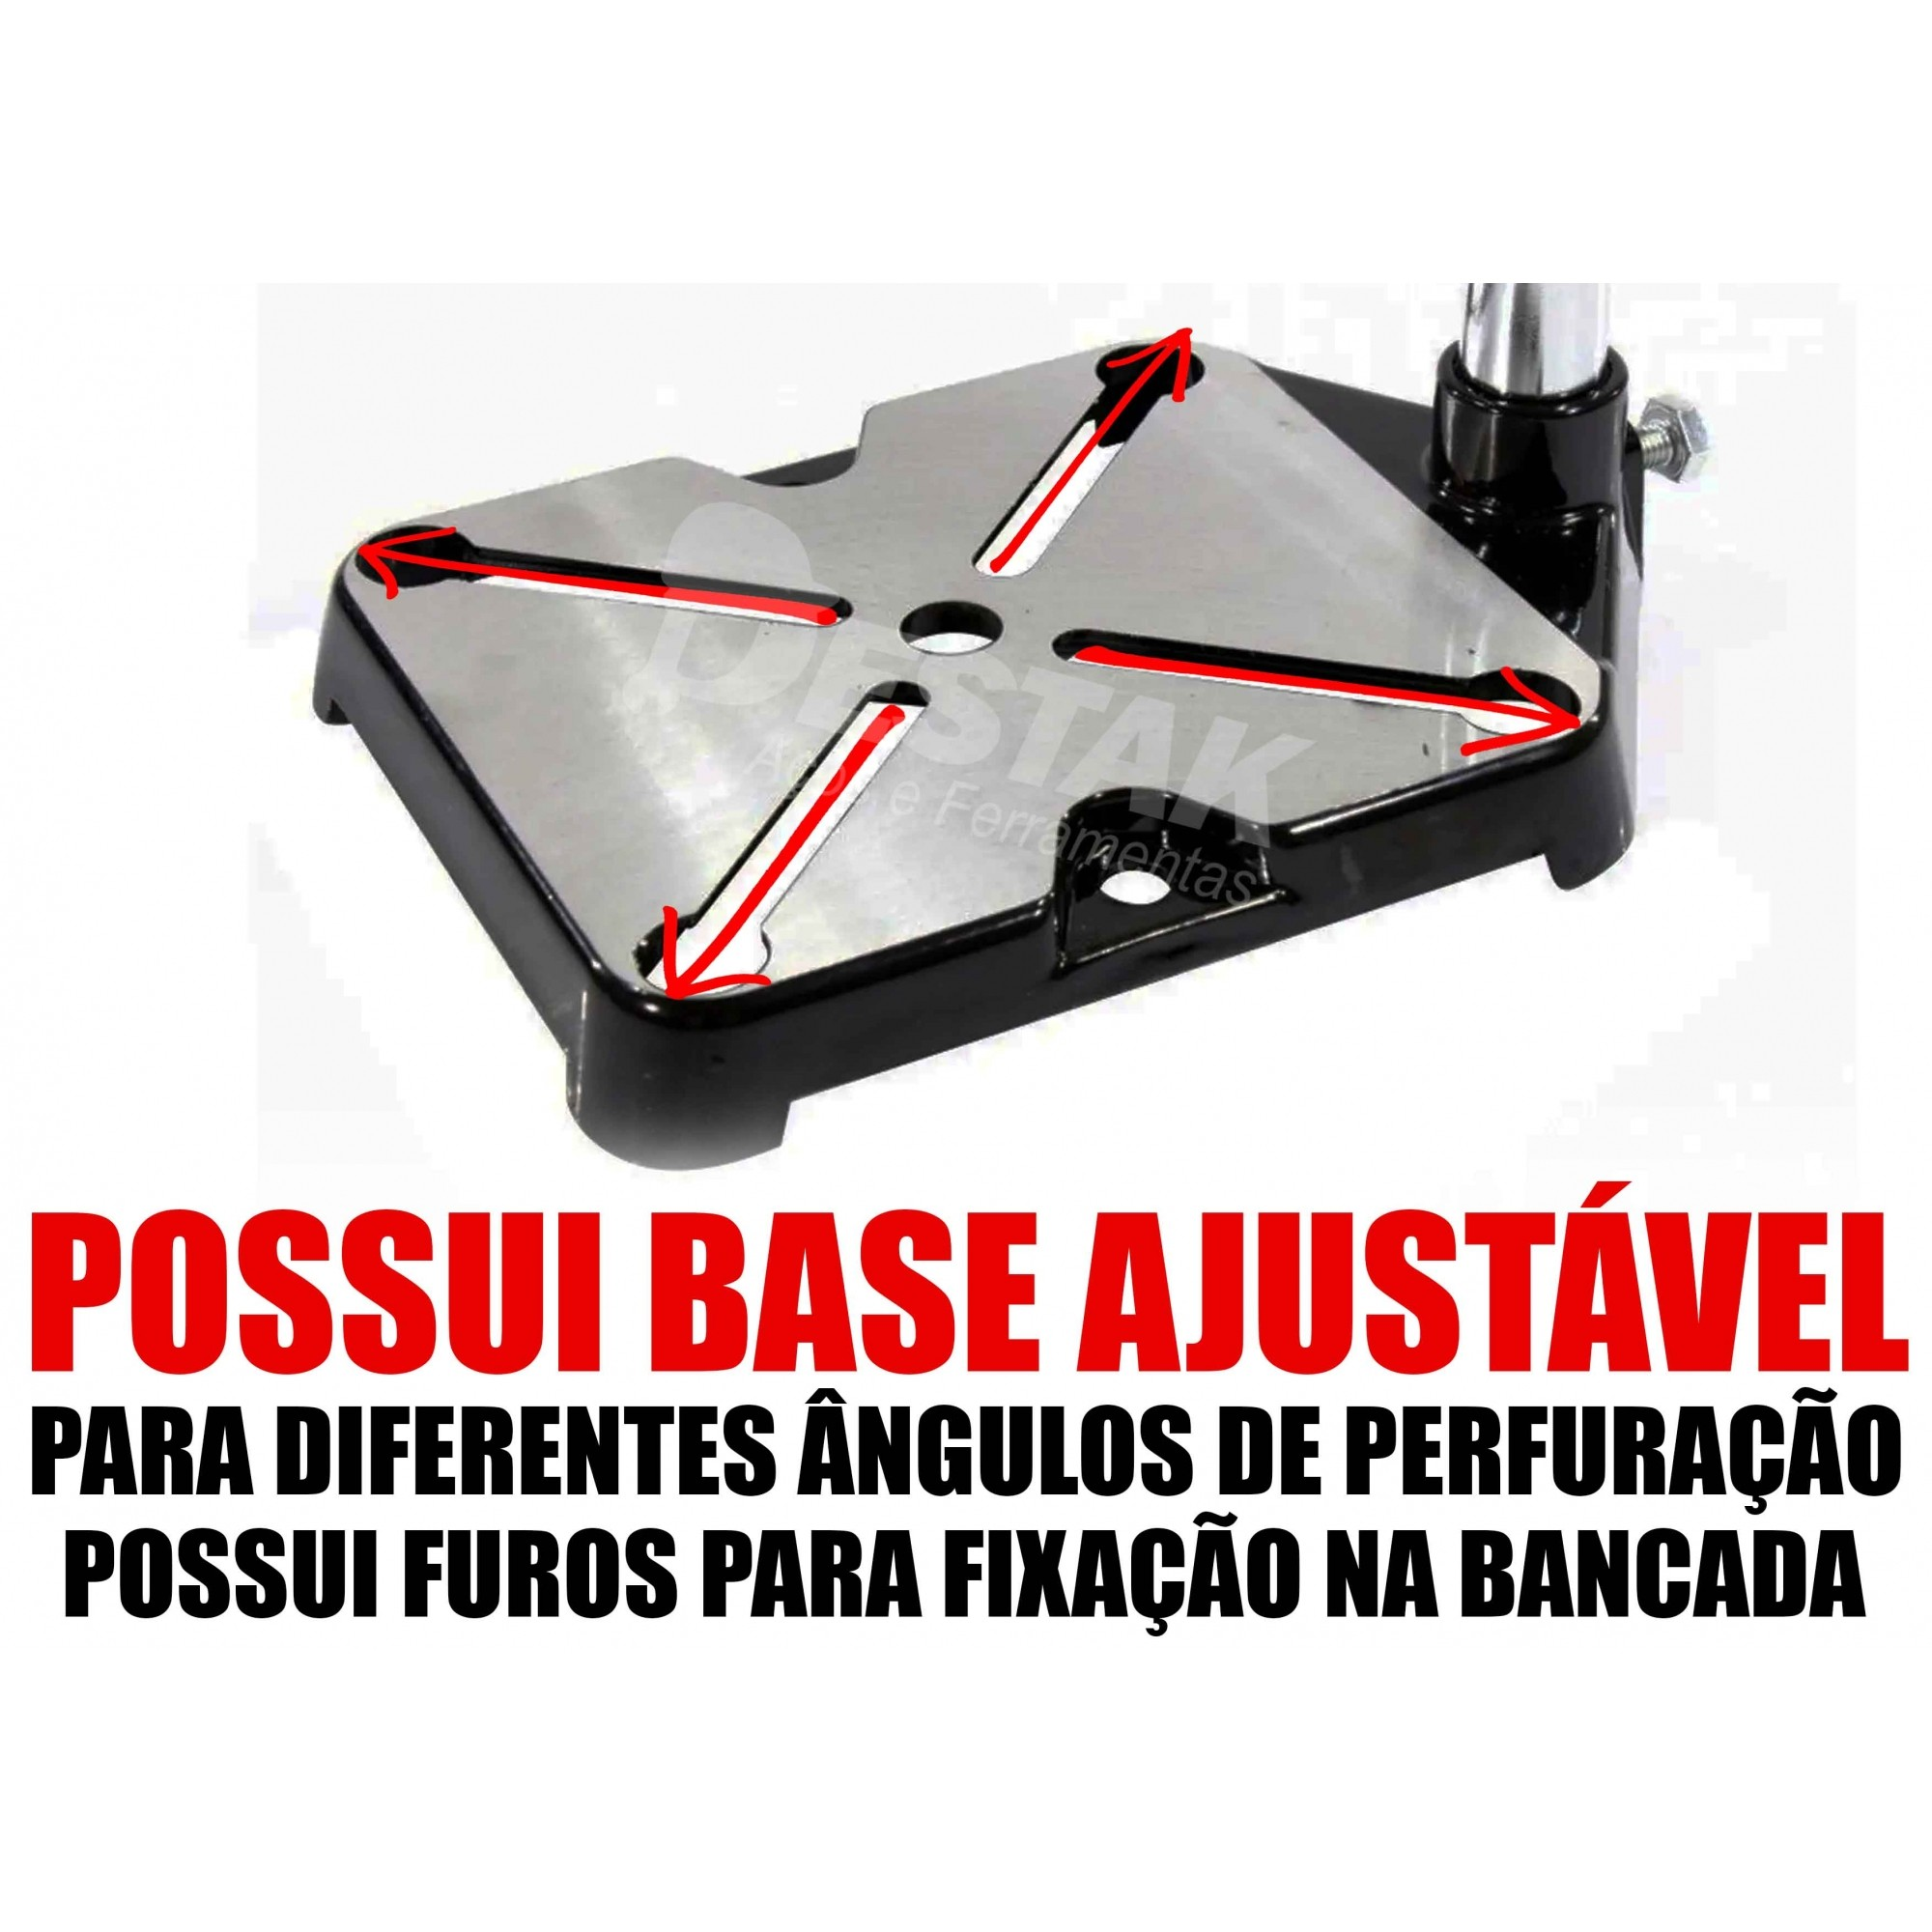 Suporte Bancada Furadeira 3/8 + Broca Bailarina 30-120mm